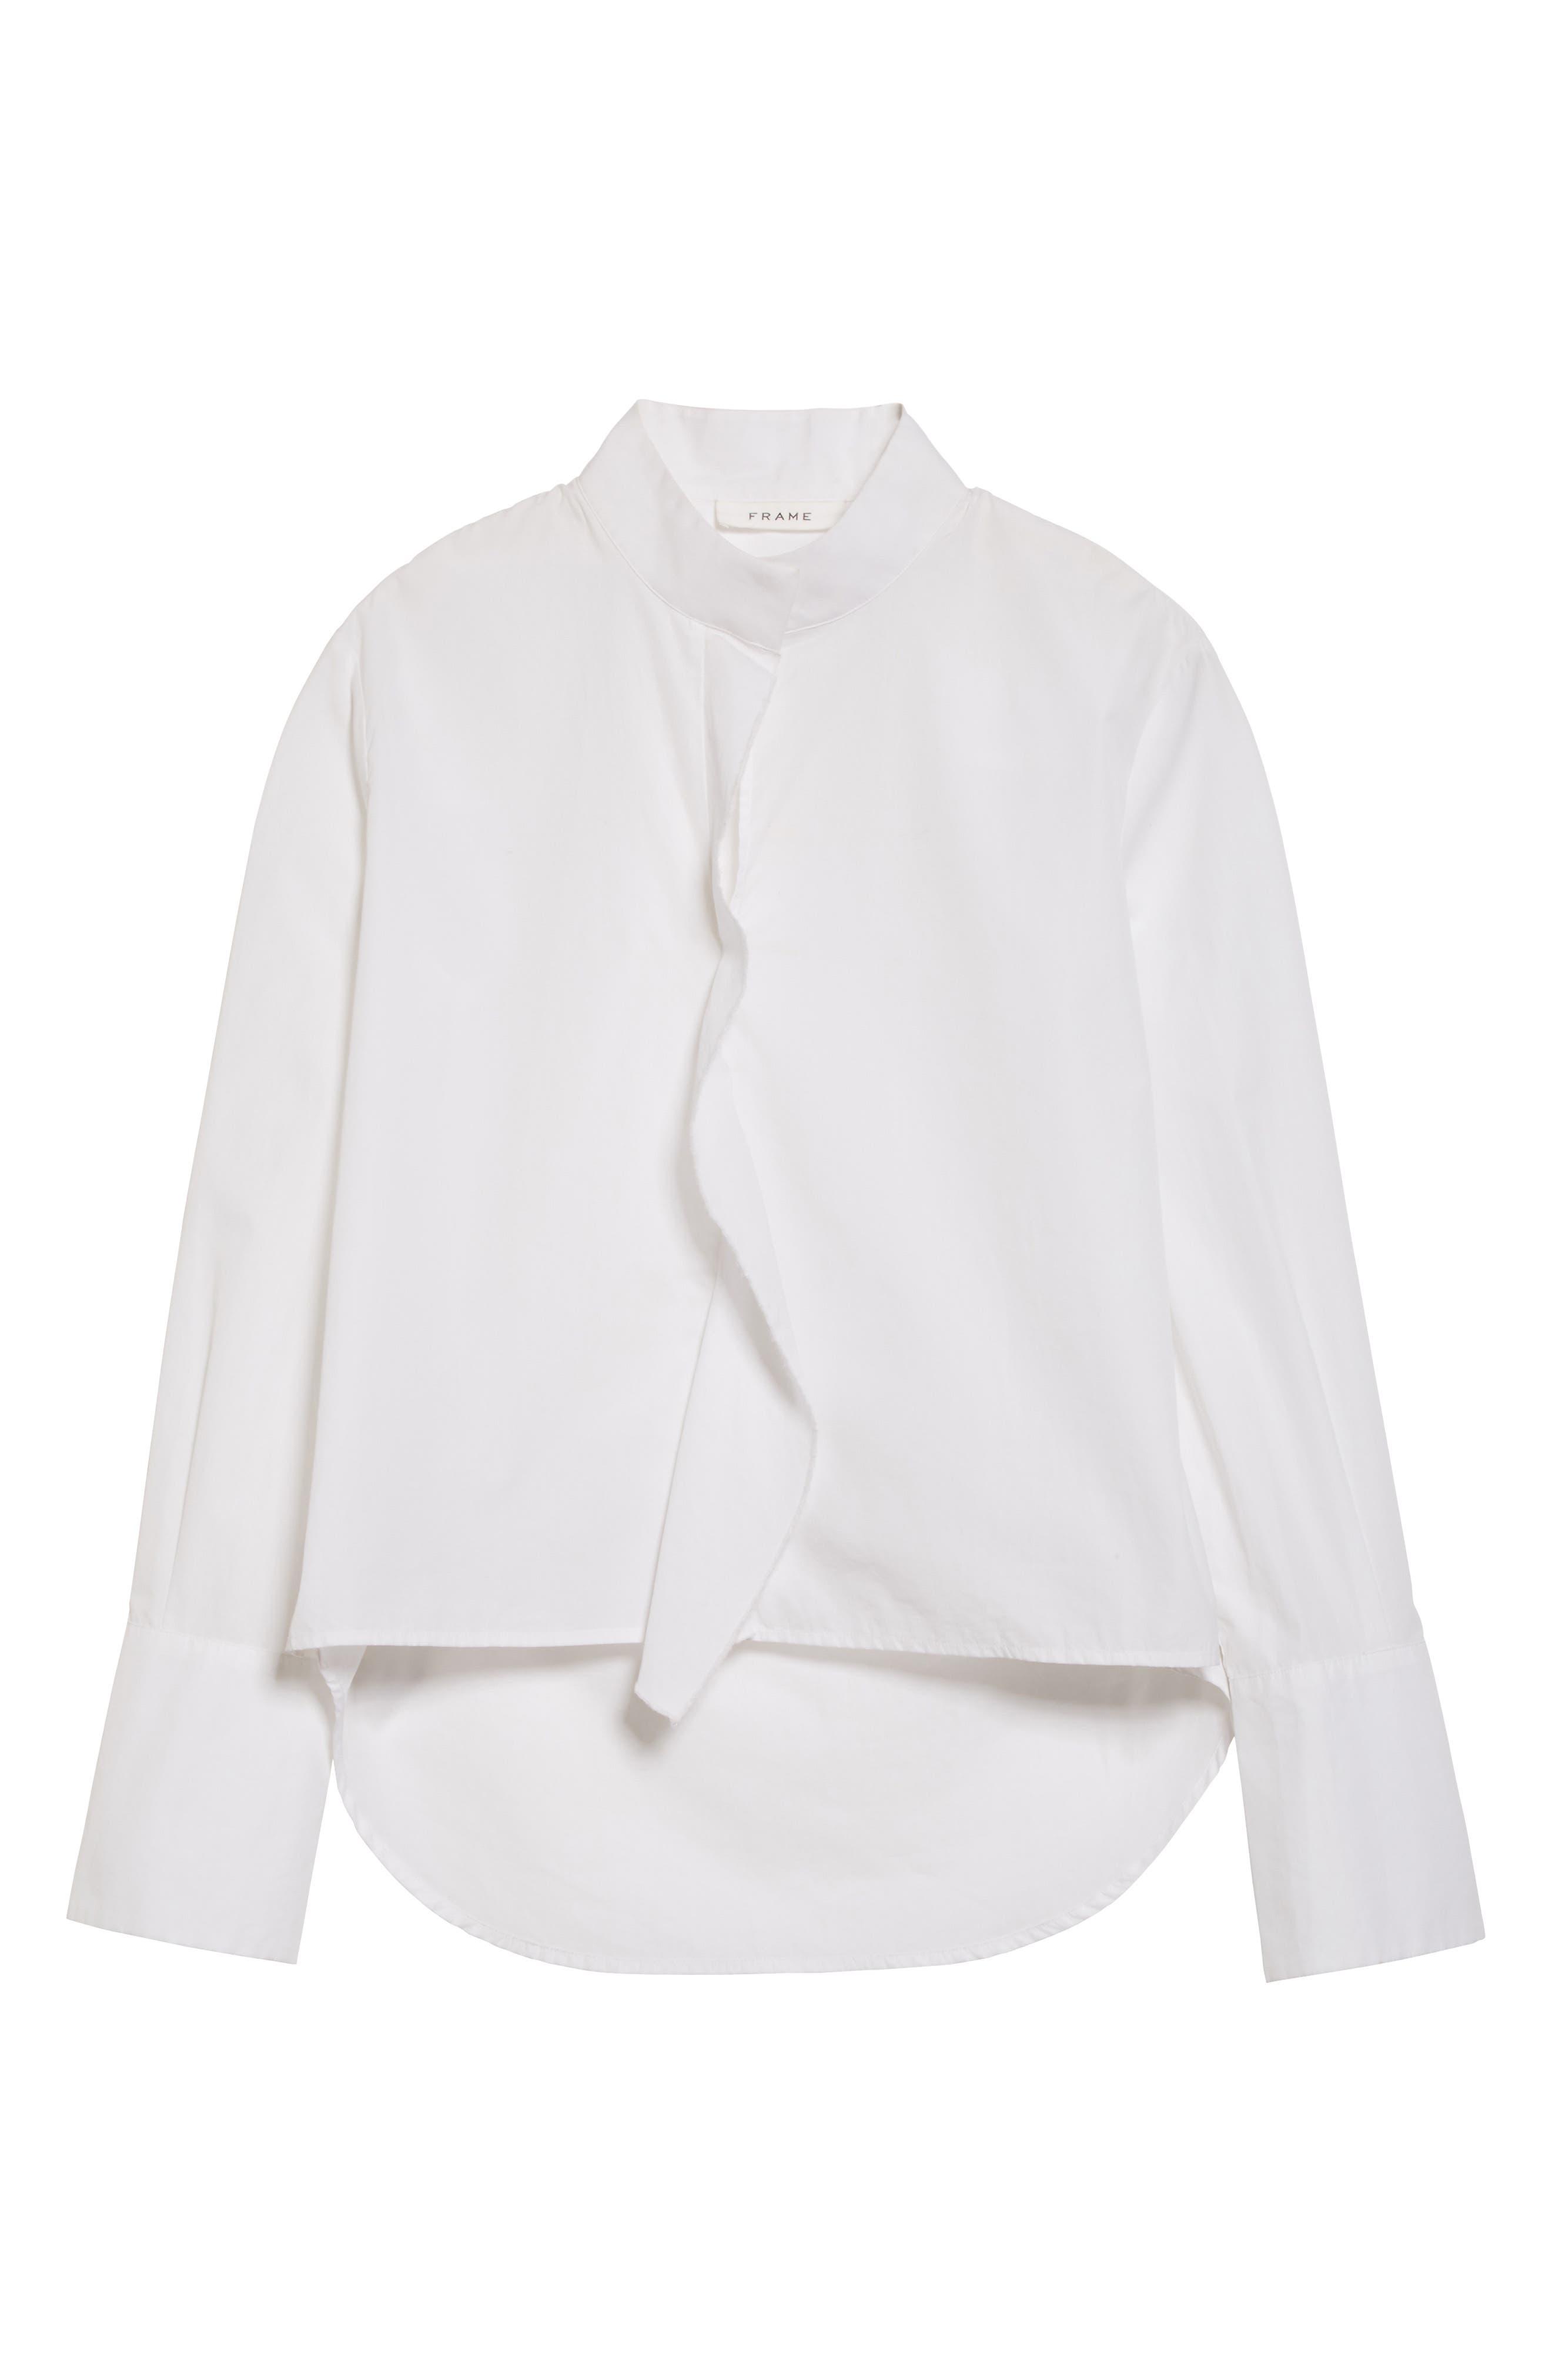 Cravat Poplin Blouse,                             Alternate thumbnail 7, color,                             Blanc